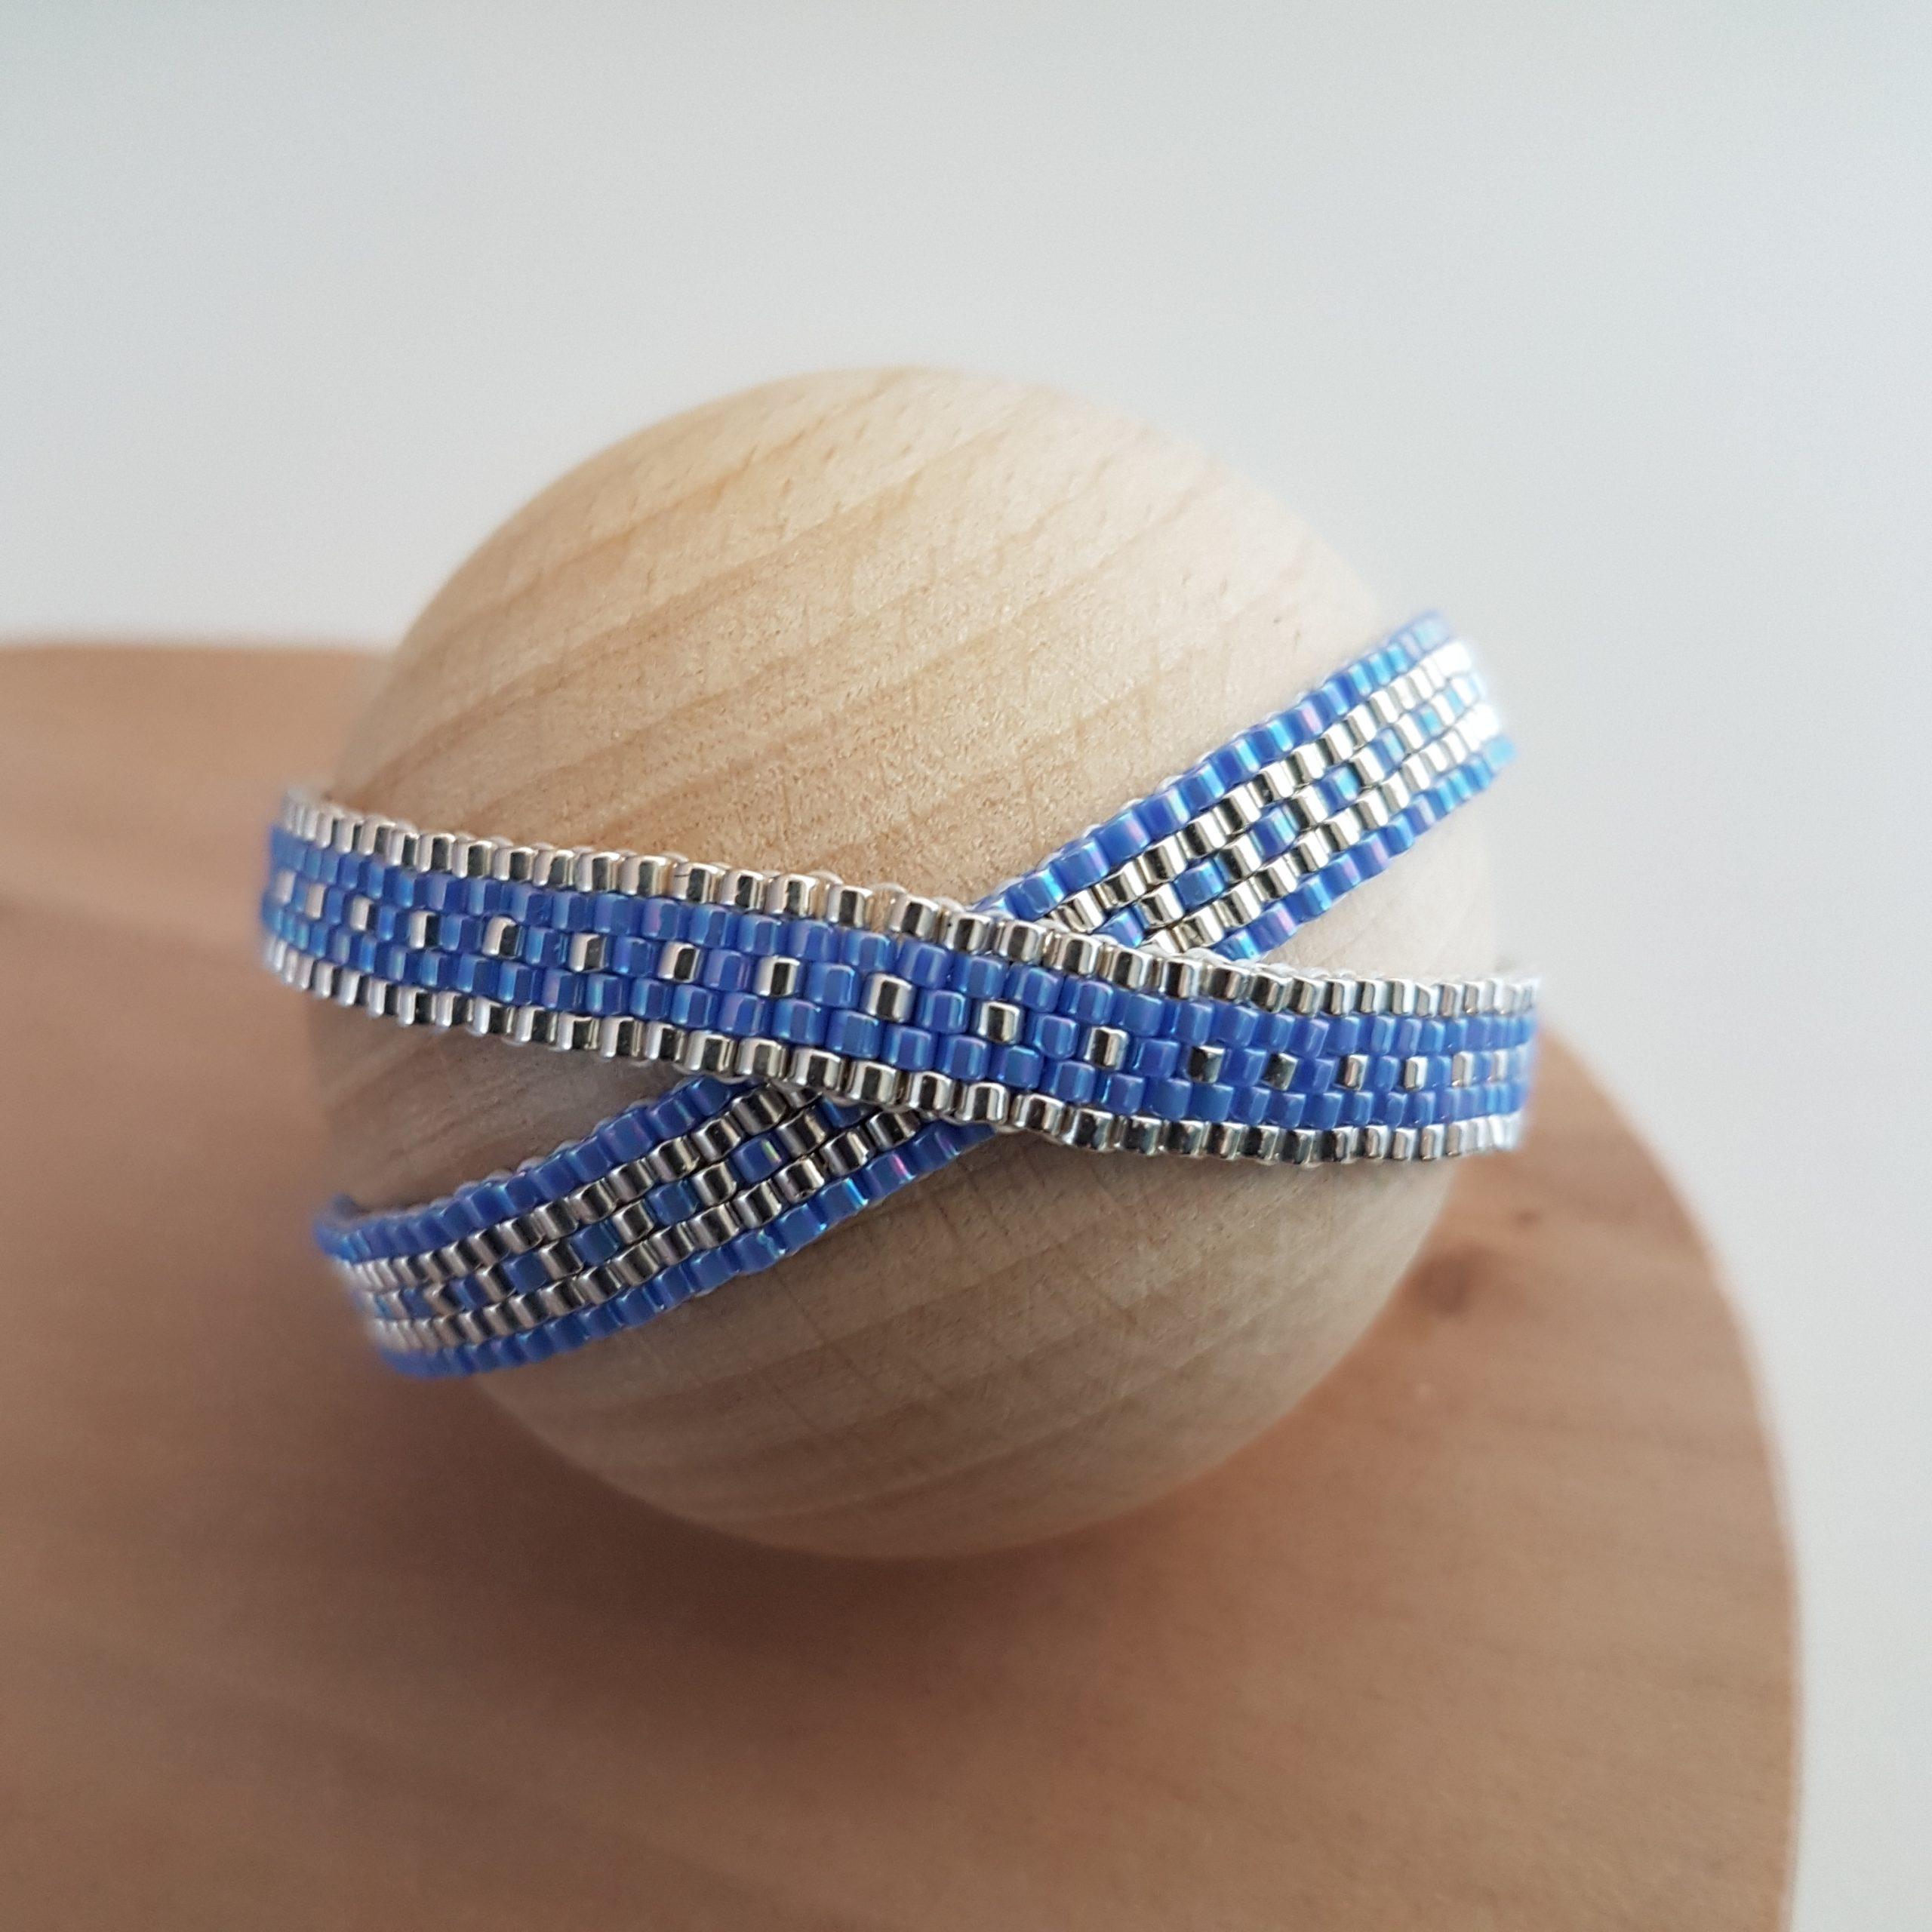 Cadeau femme Bijou artisanal lyon Bracelet Les cumulables bleu lavande argent 925 miyuki